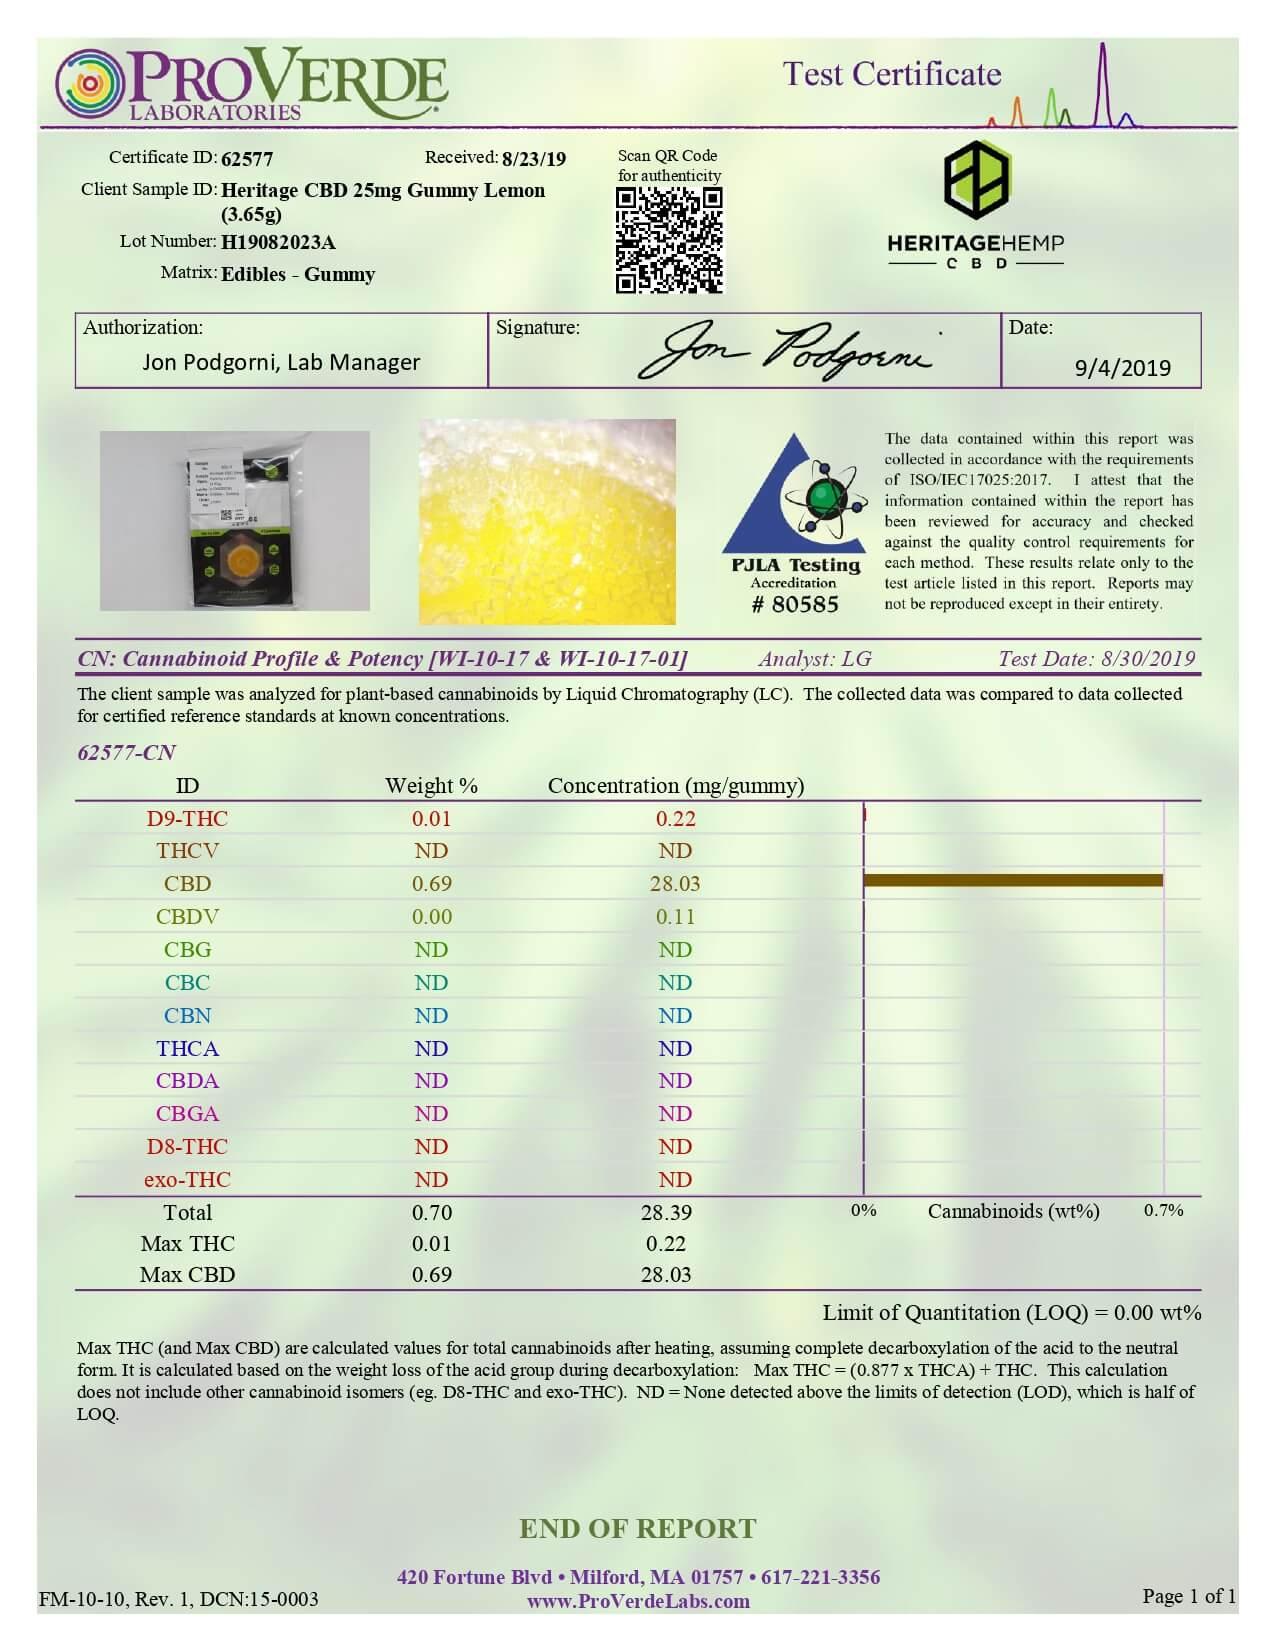 Heritage Hemp CBD Edible Gummies 25mg Lab Report